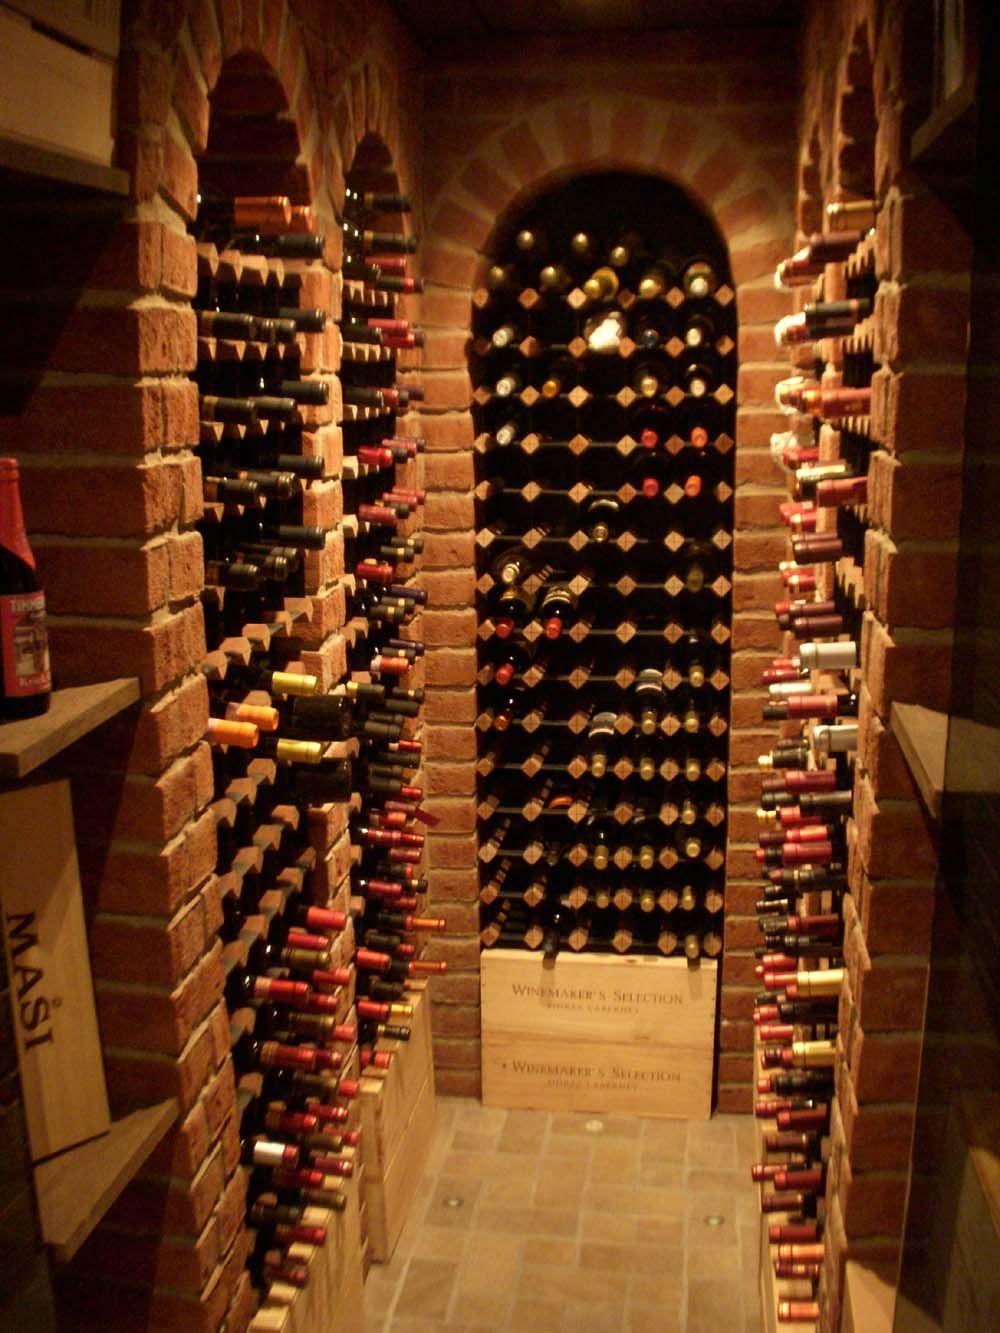 Private Wine Cellar In Sweden Featuring Boxx Wine Racks